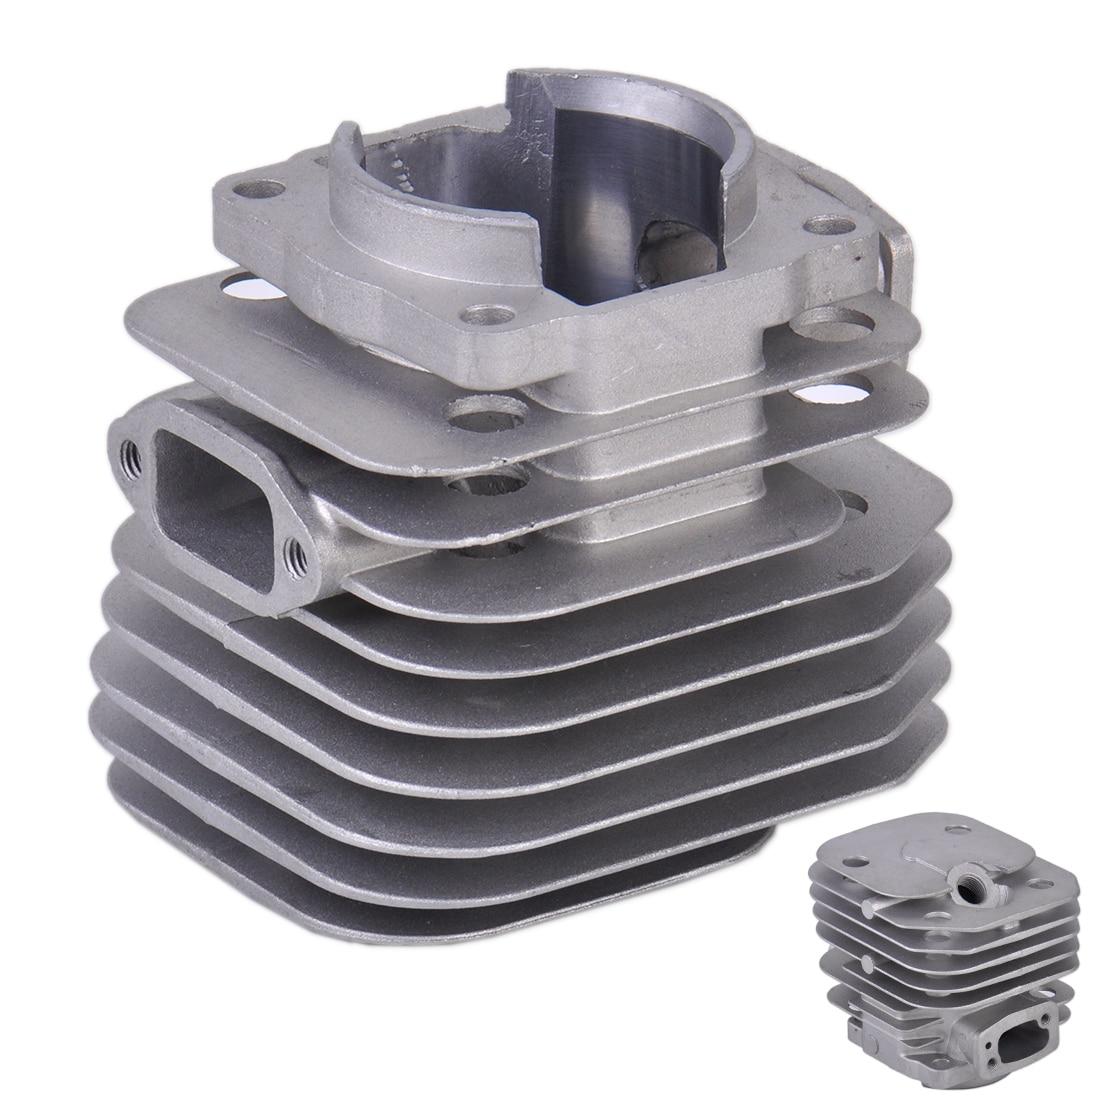 где купить LETAOSK 50mm Piston Rings Assembly Kit fit for Husqvarna 371 372 371XP 372XP Chainsaw 503691271 по лучшей цене